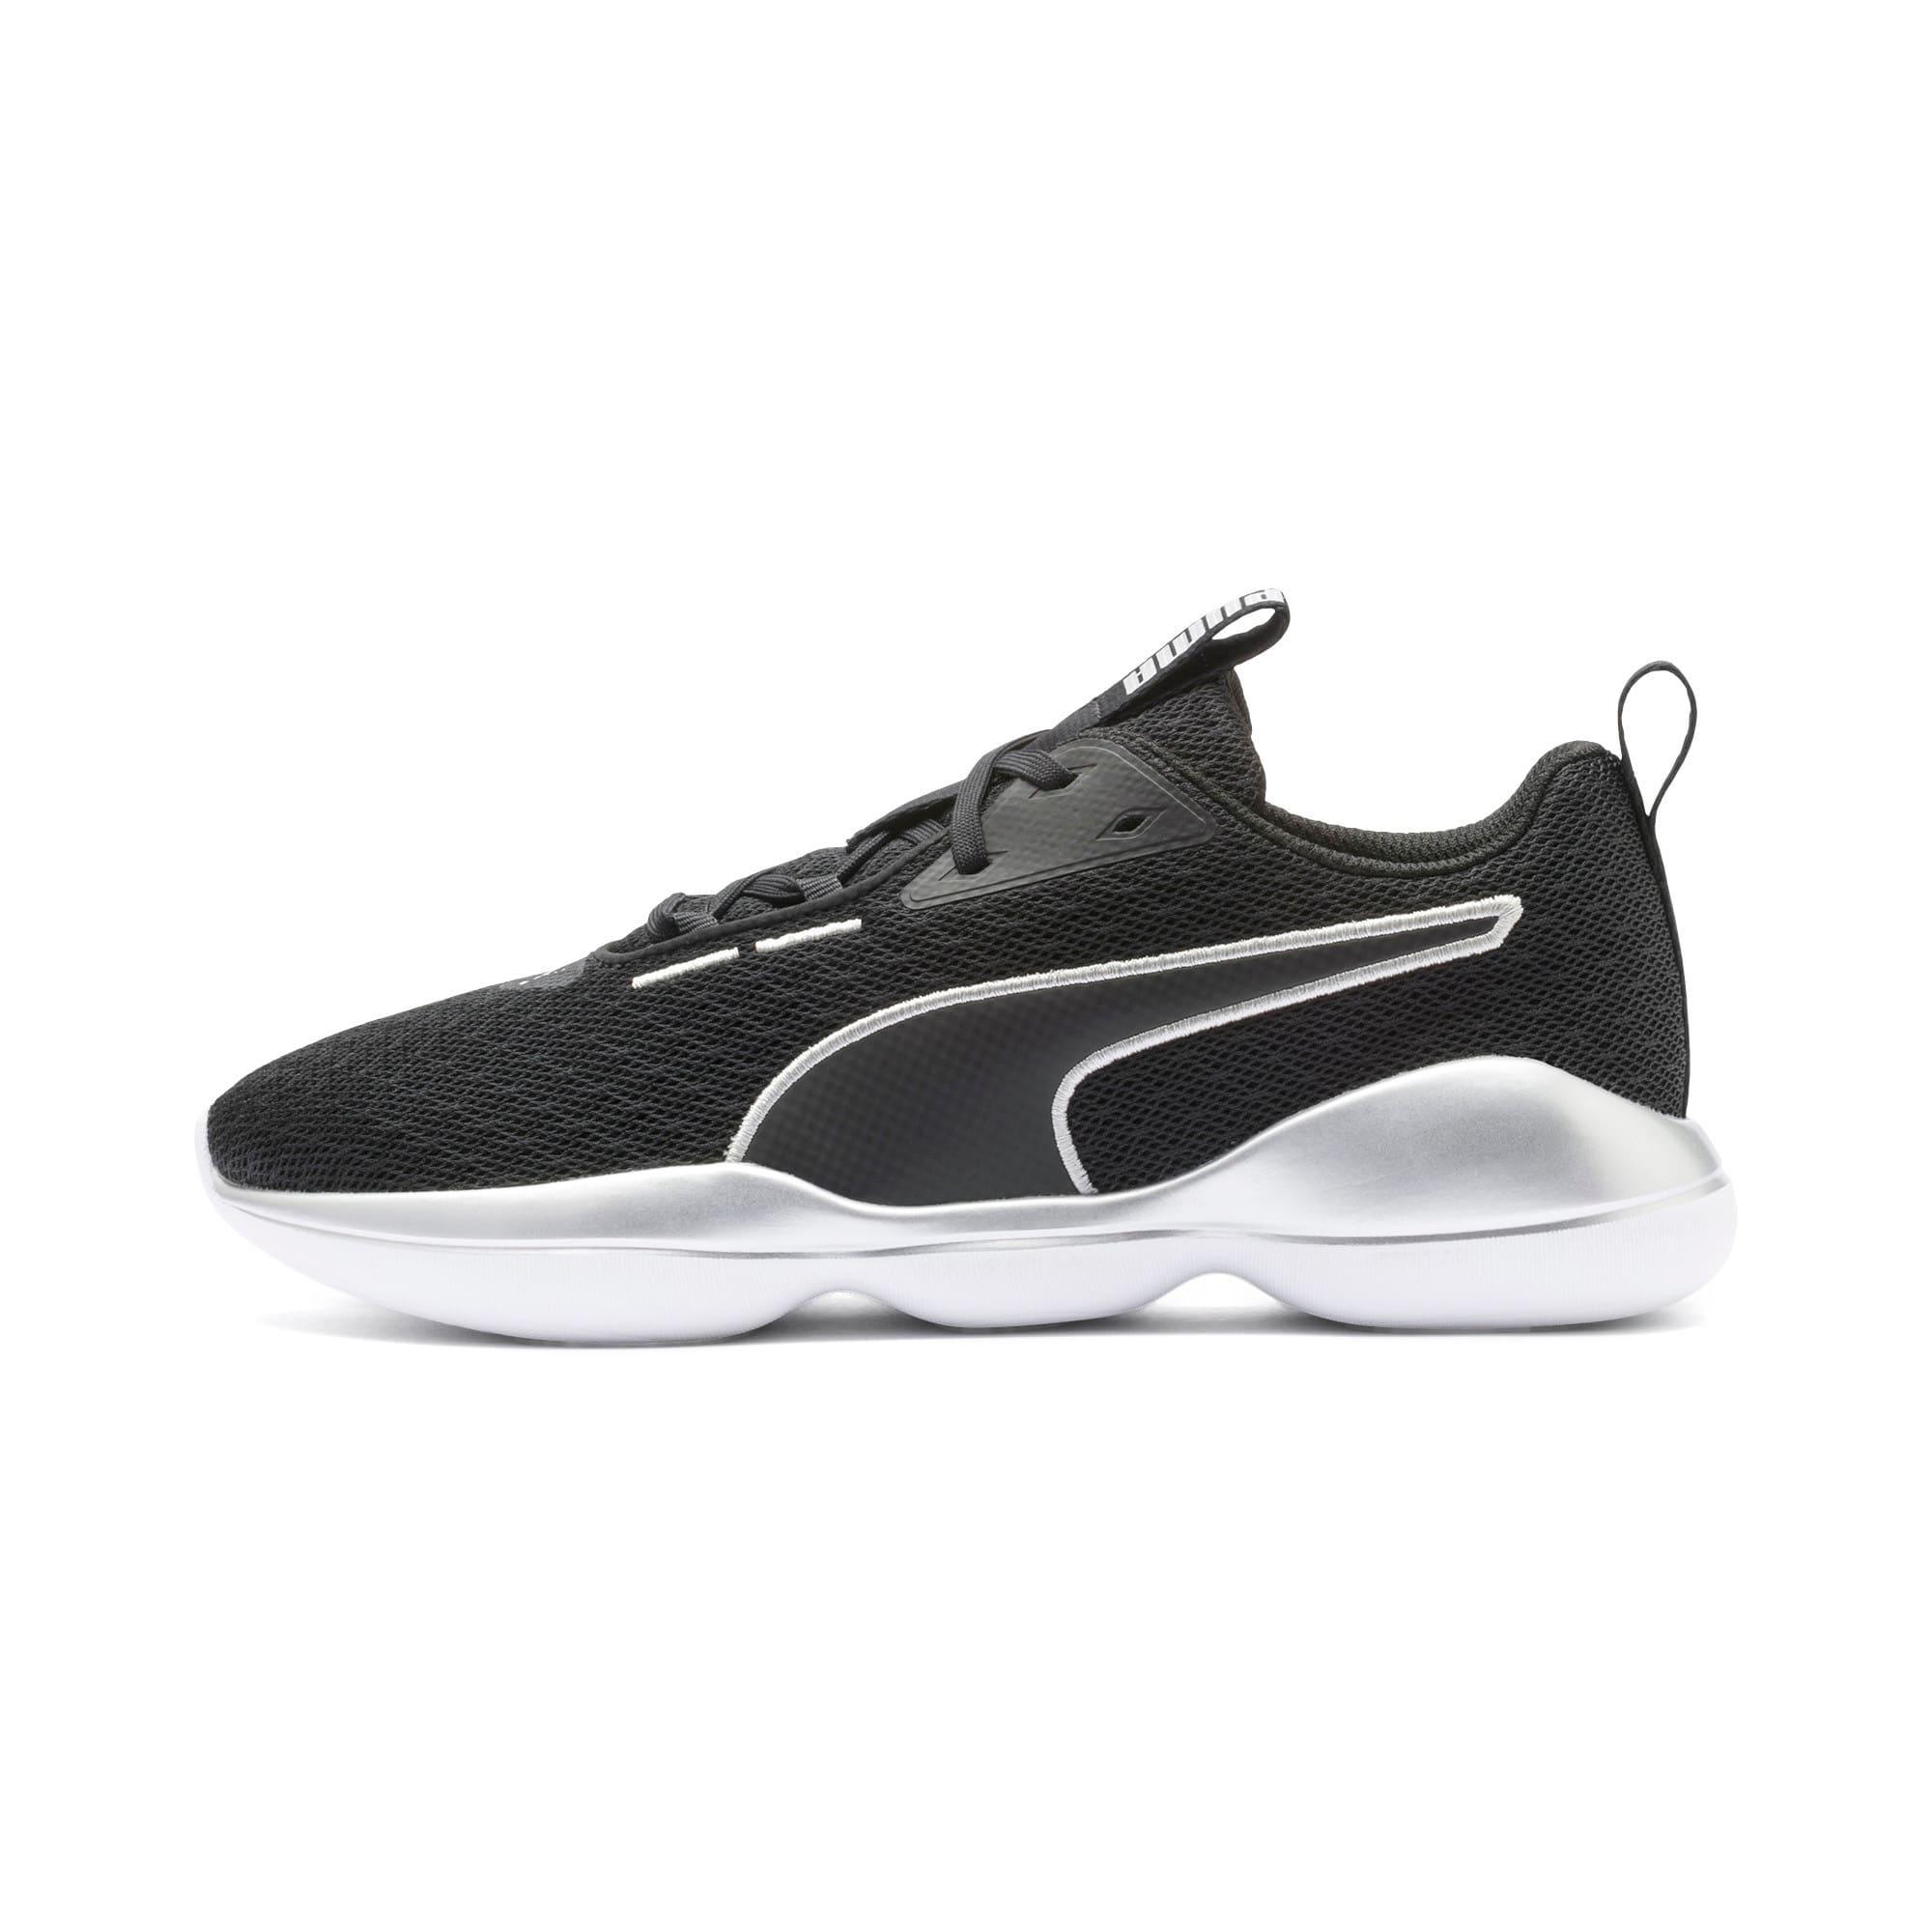 Thumbnail 1 of Flourish FS Women's Training Shoes, Puma Black-Puma White, medium